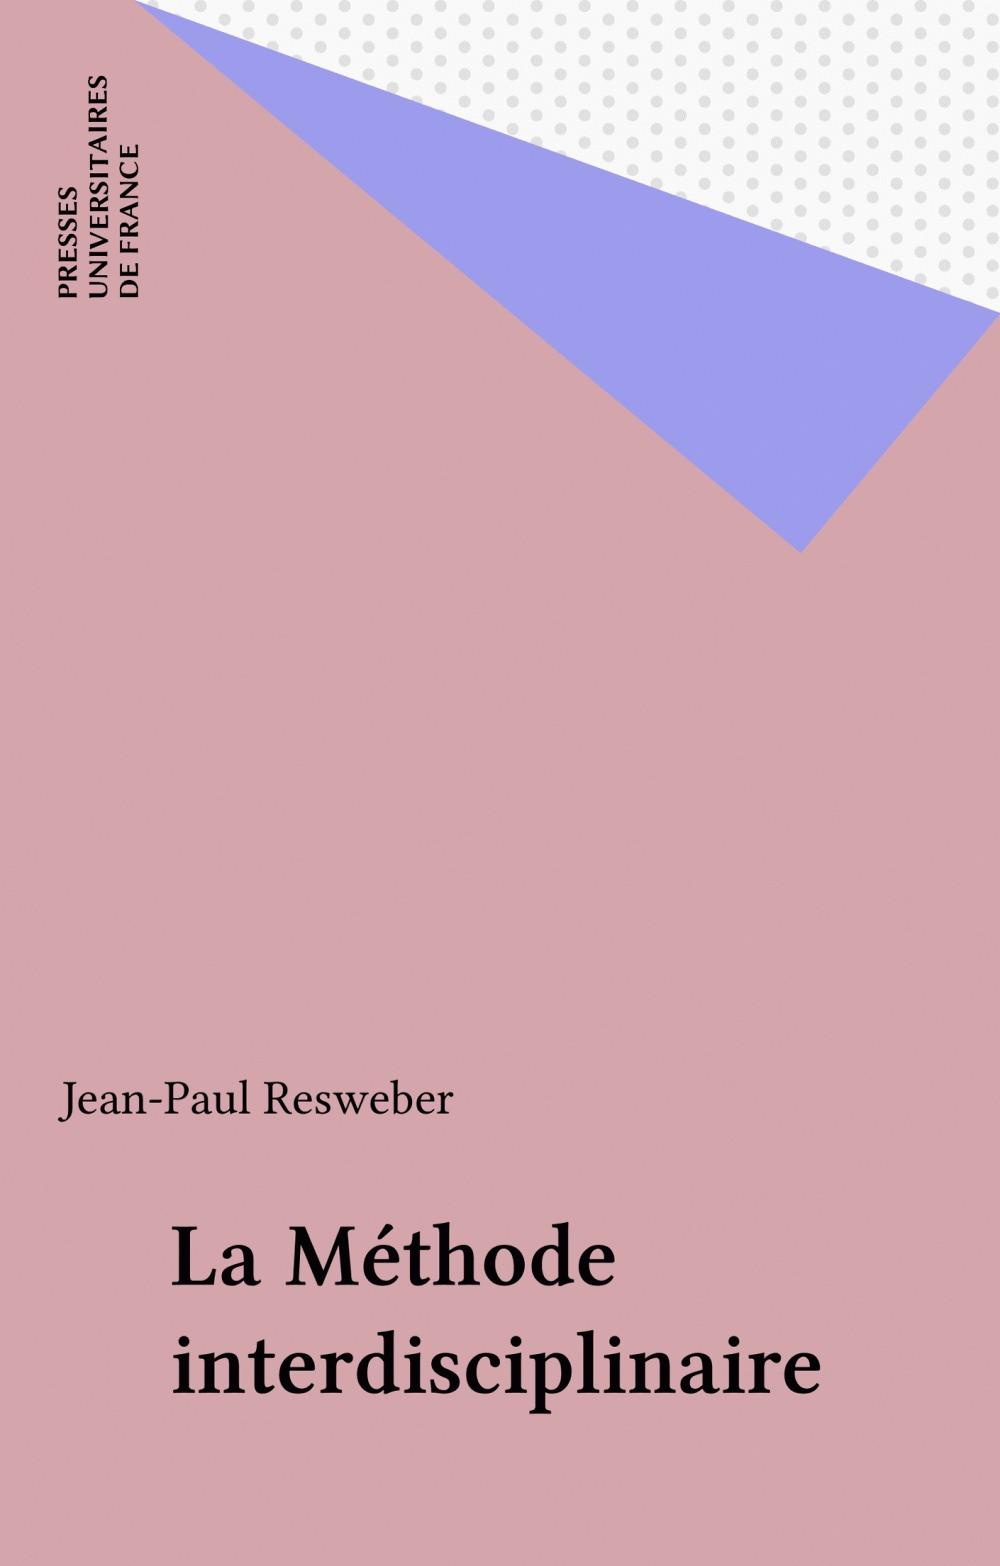 la methode interdisciplinaire